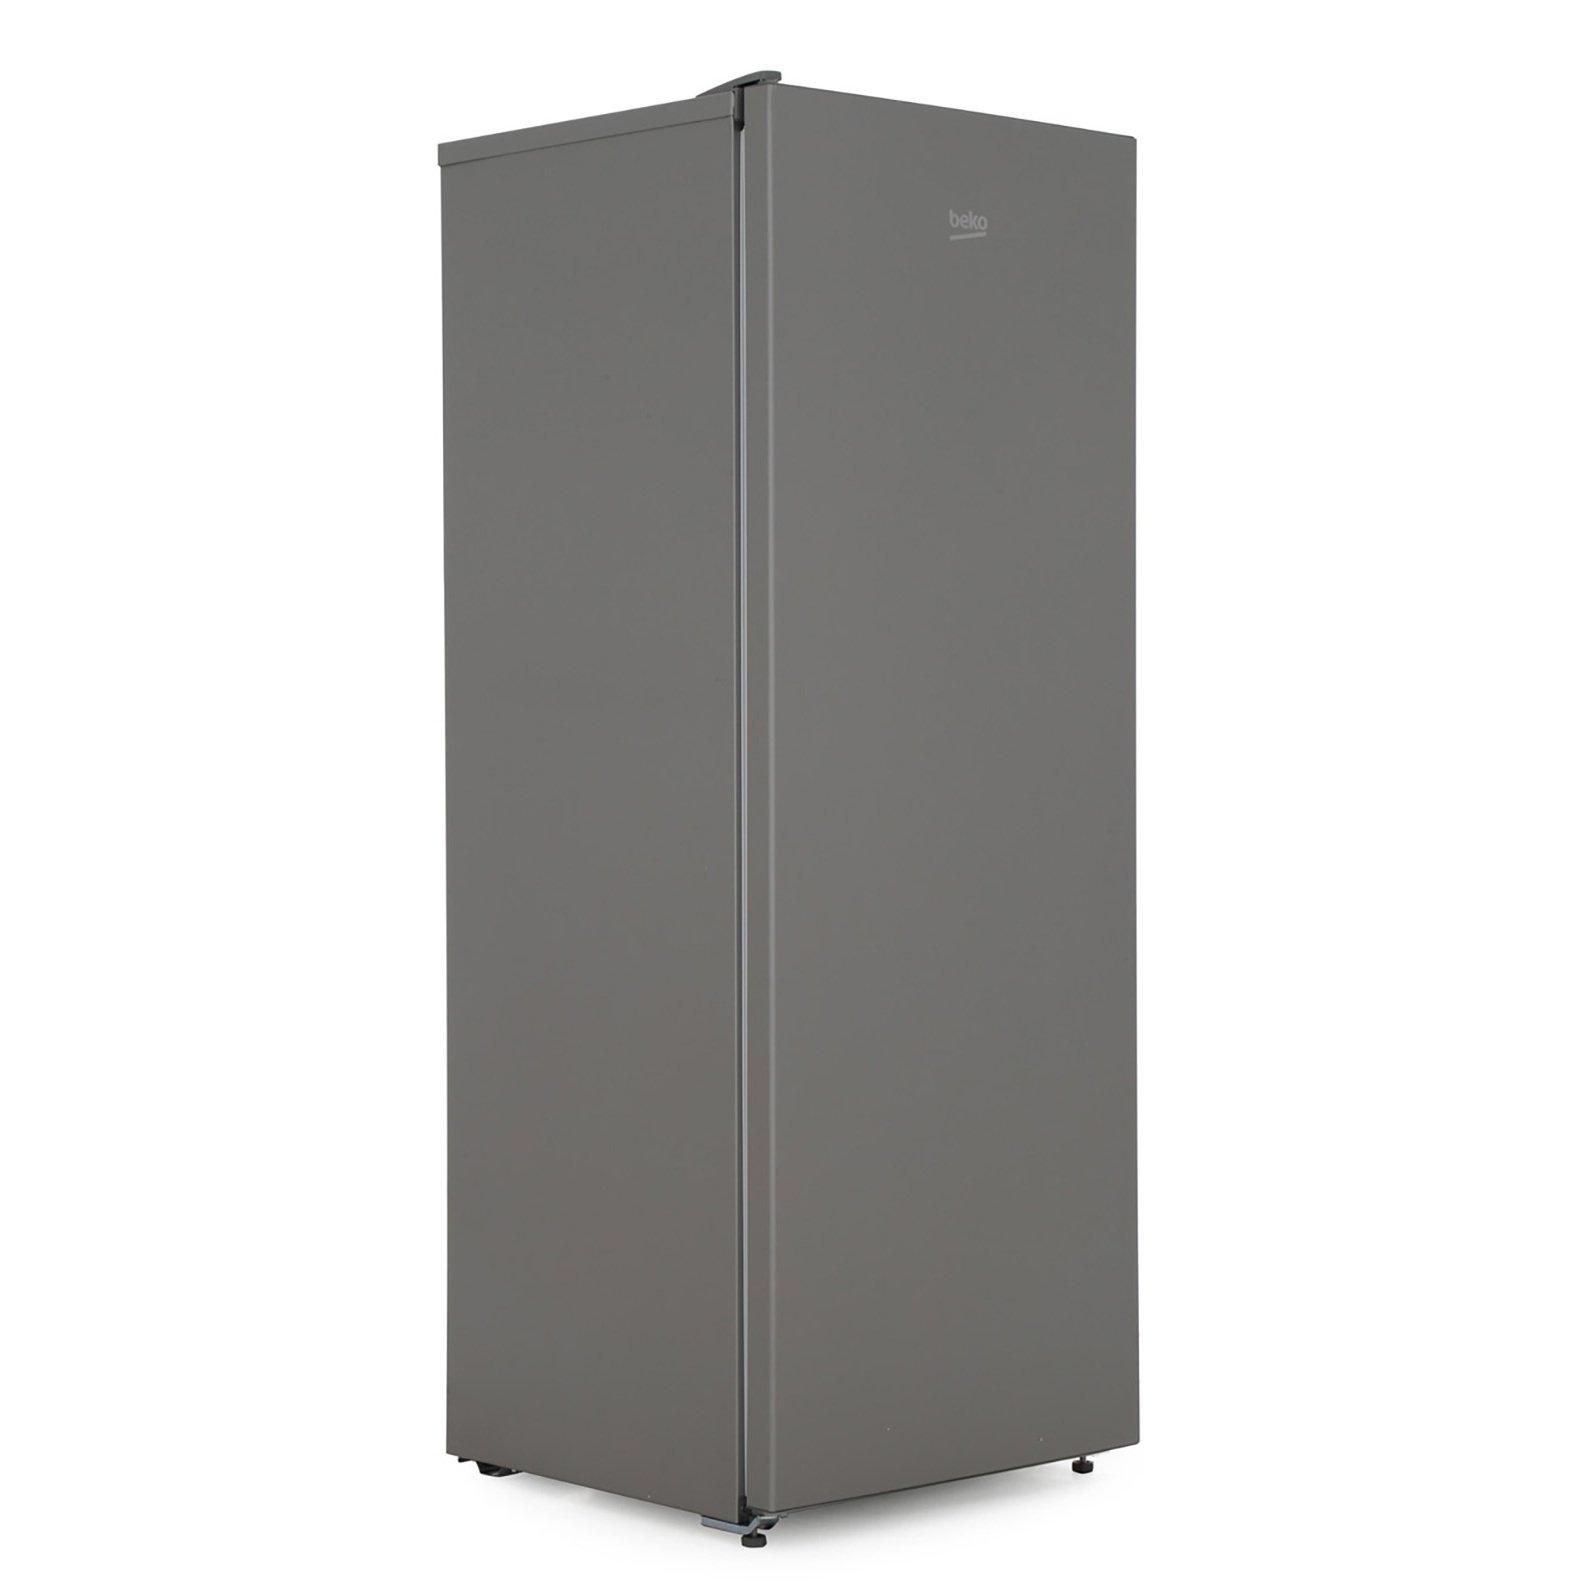 Beko FFG1545S Tall Freezer